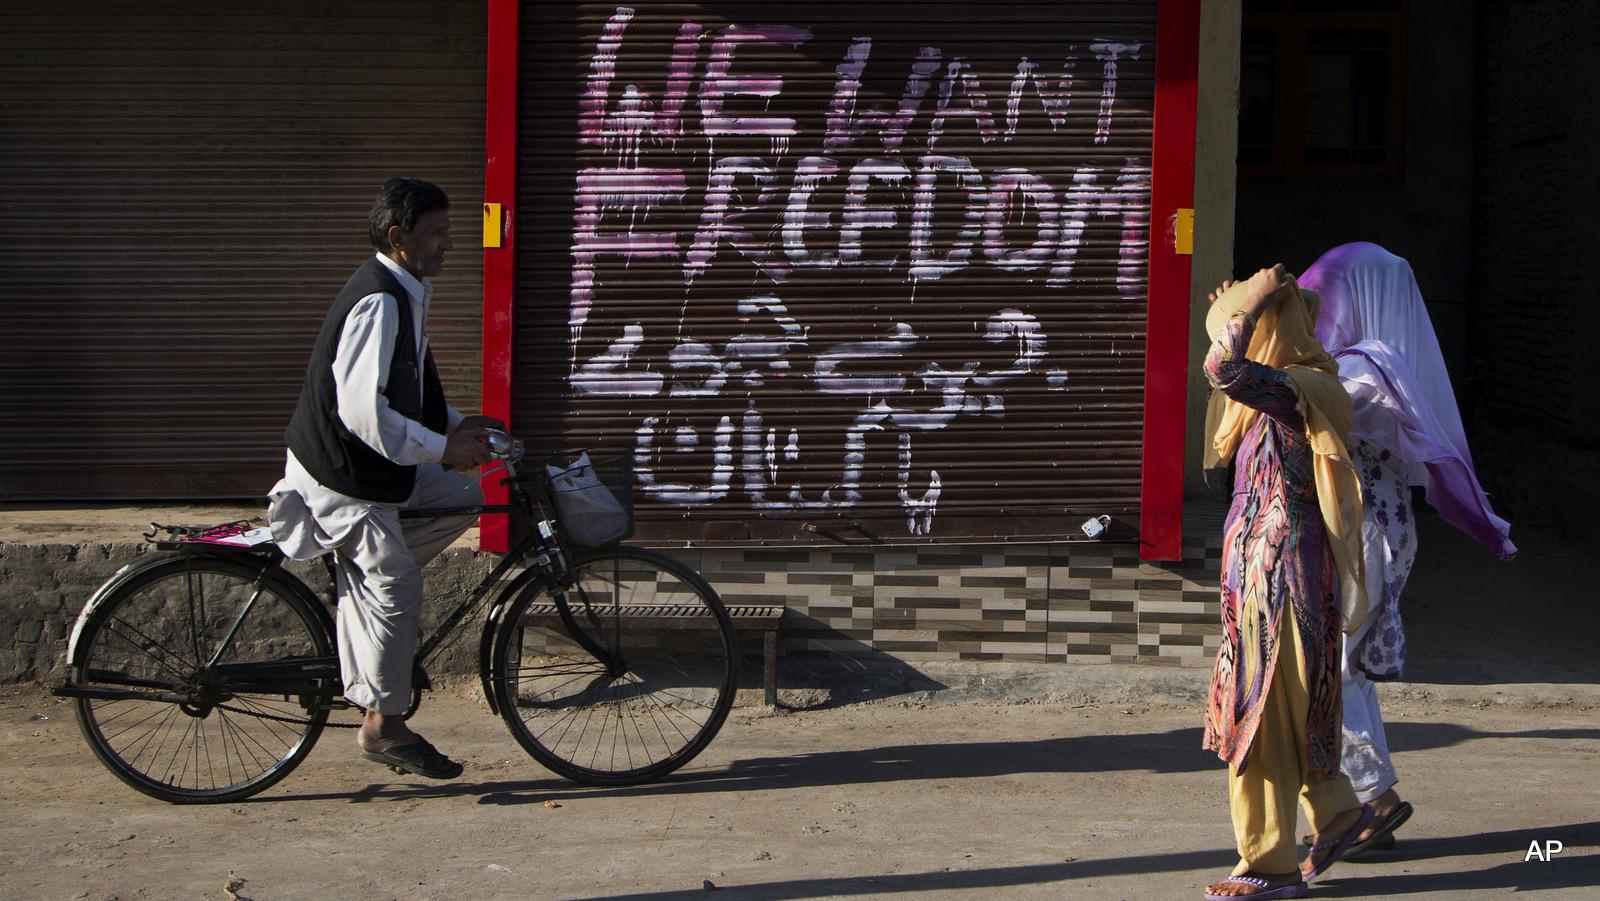 "Kashmiri women walk past a closed market with graffiti painted on the shutter of a shop in Urdu that reads ""Long live Pakistan"" in Srinagar, Indian occupied Kashmir, Thursday, Sept. 29, 2016."